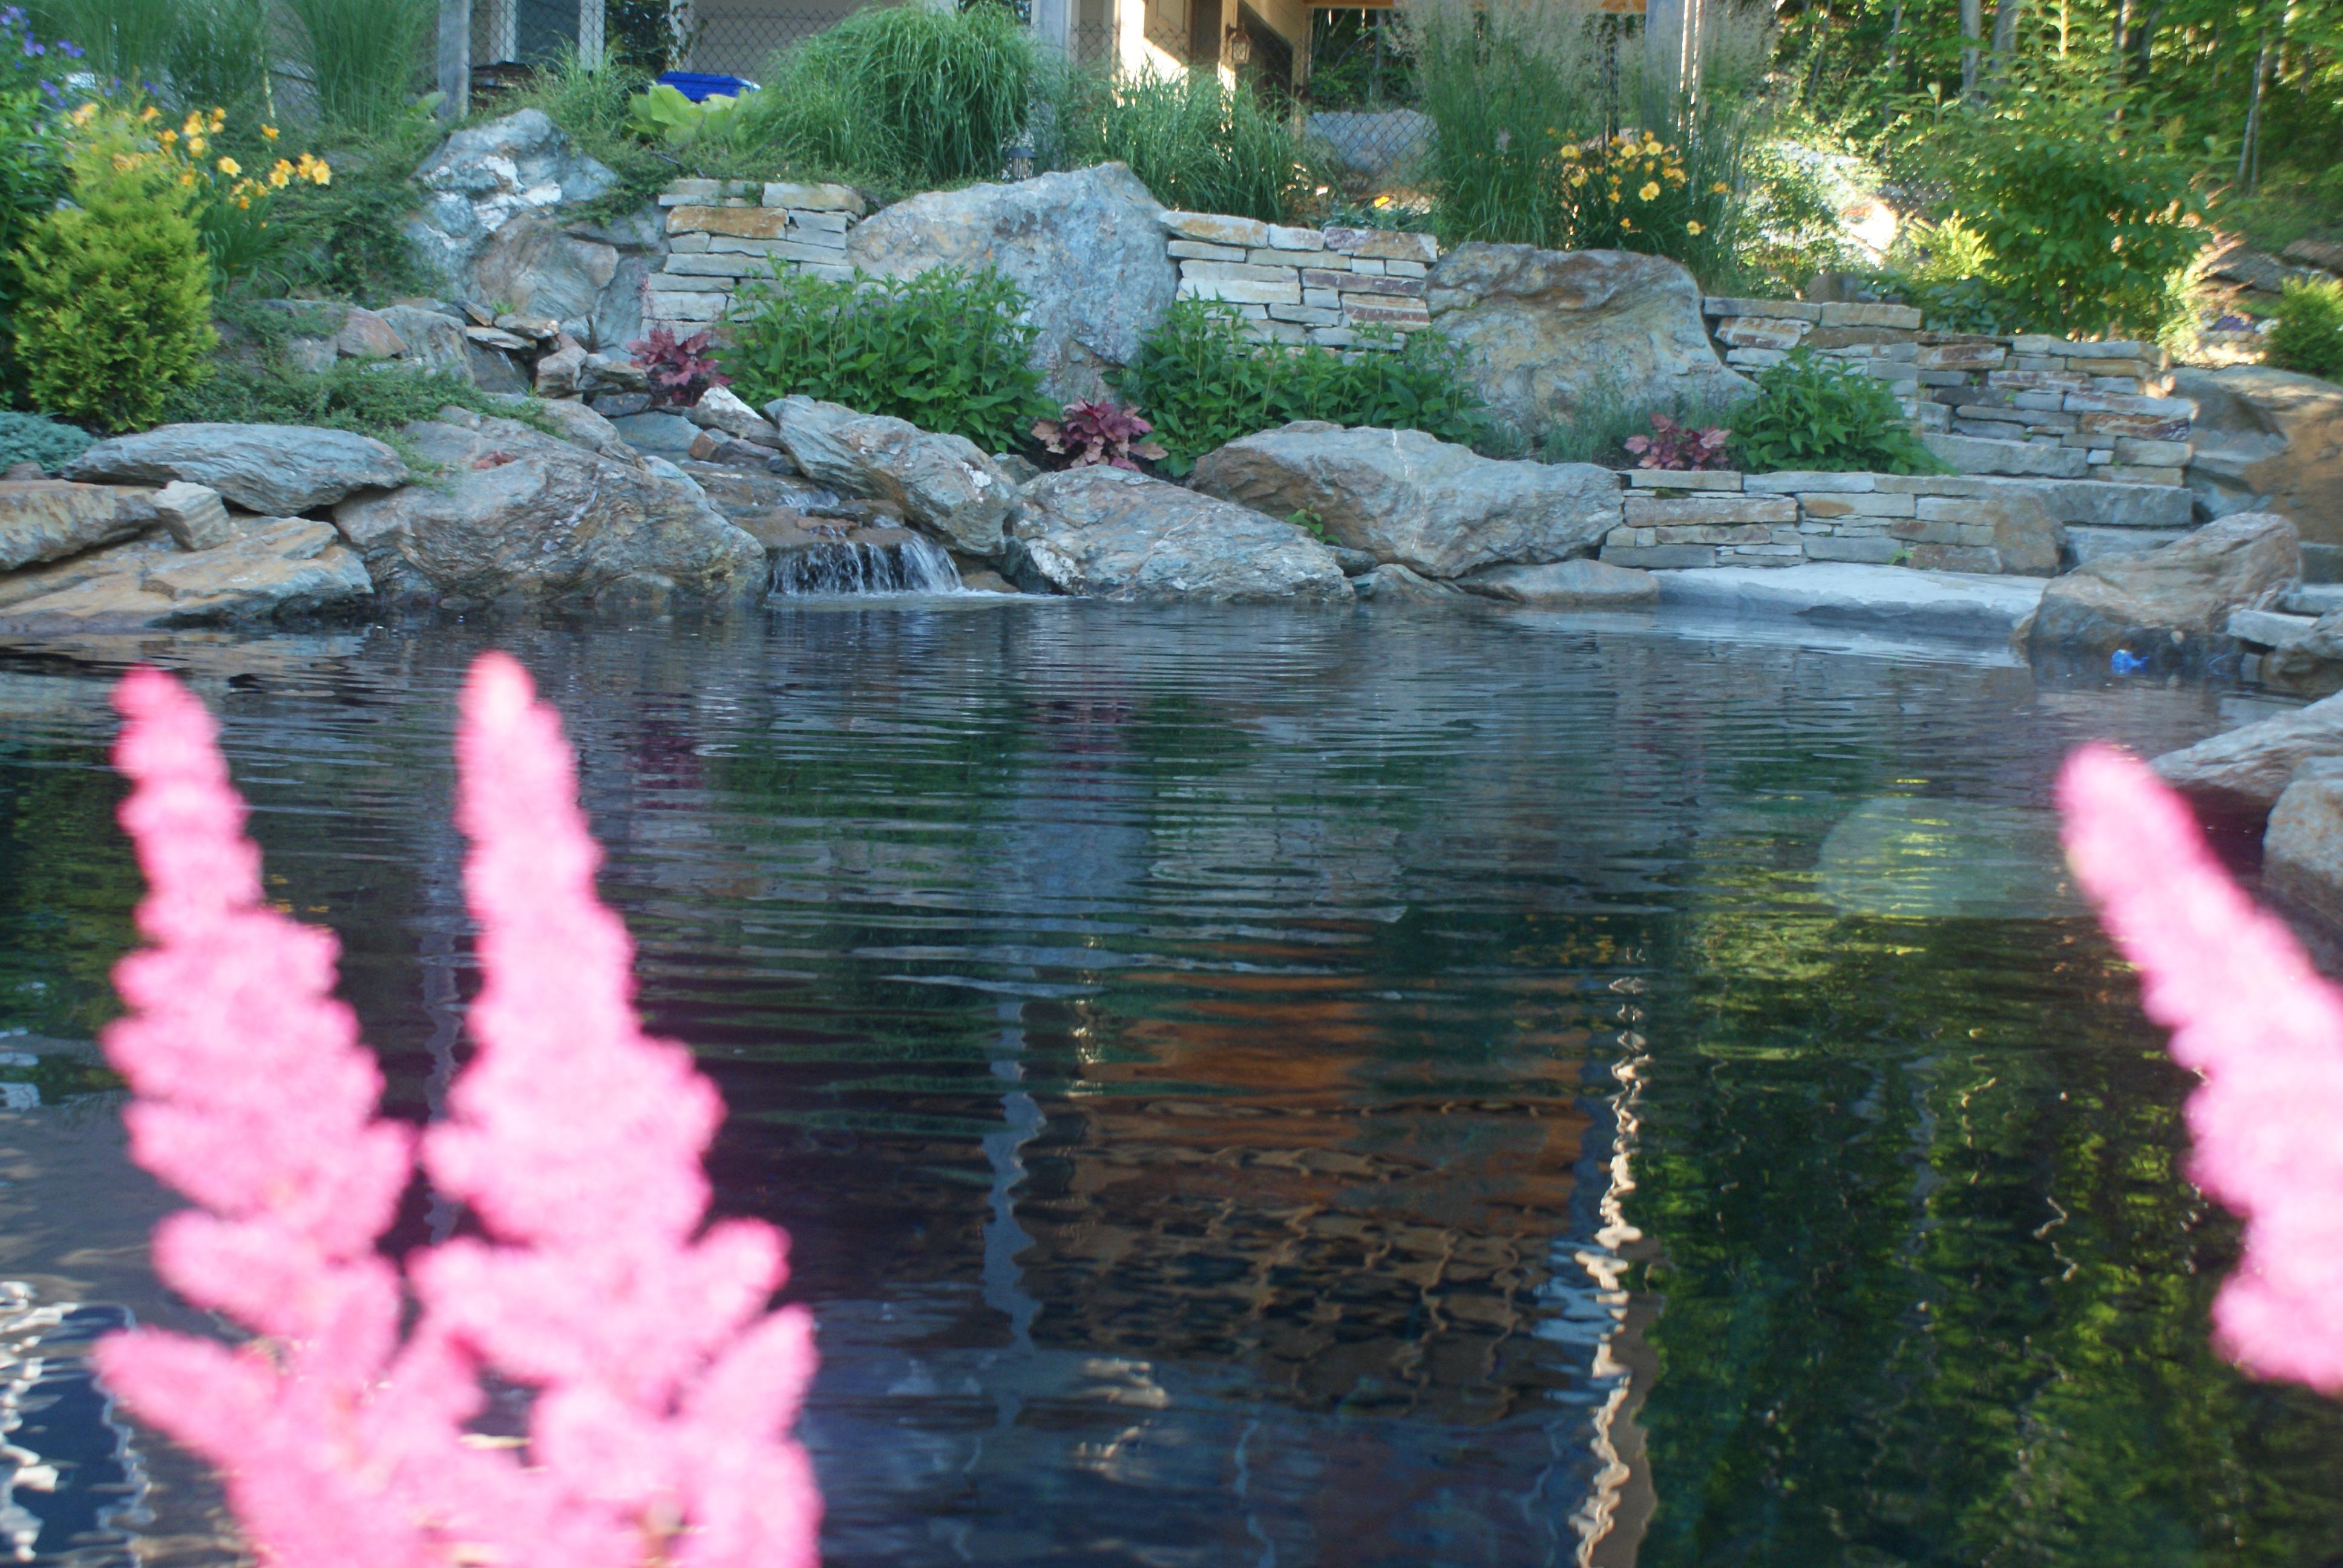 bassin naturel pour la baignade